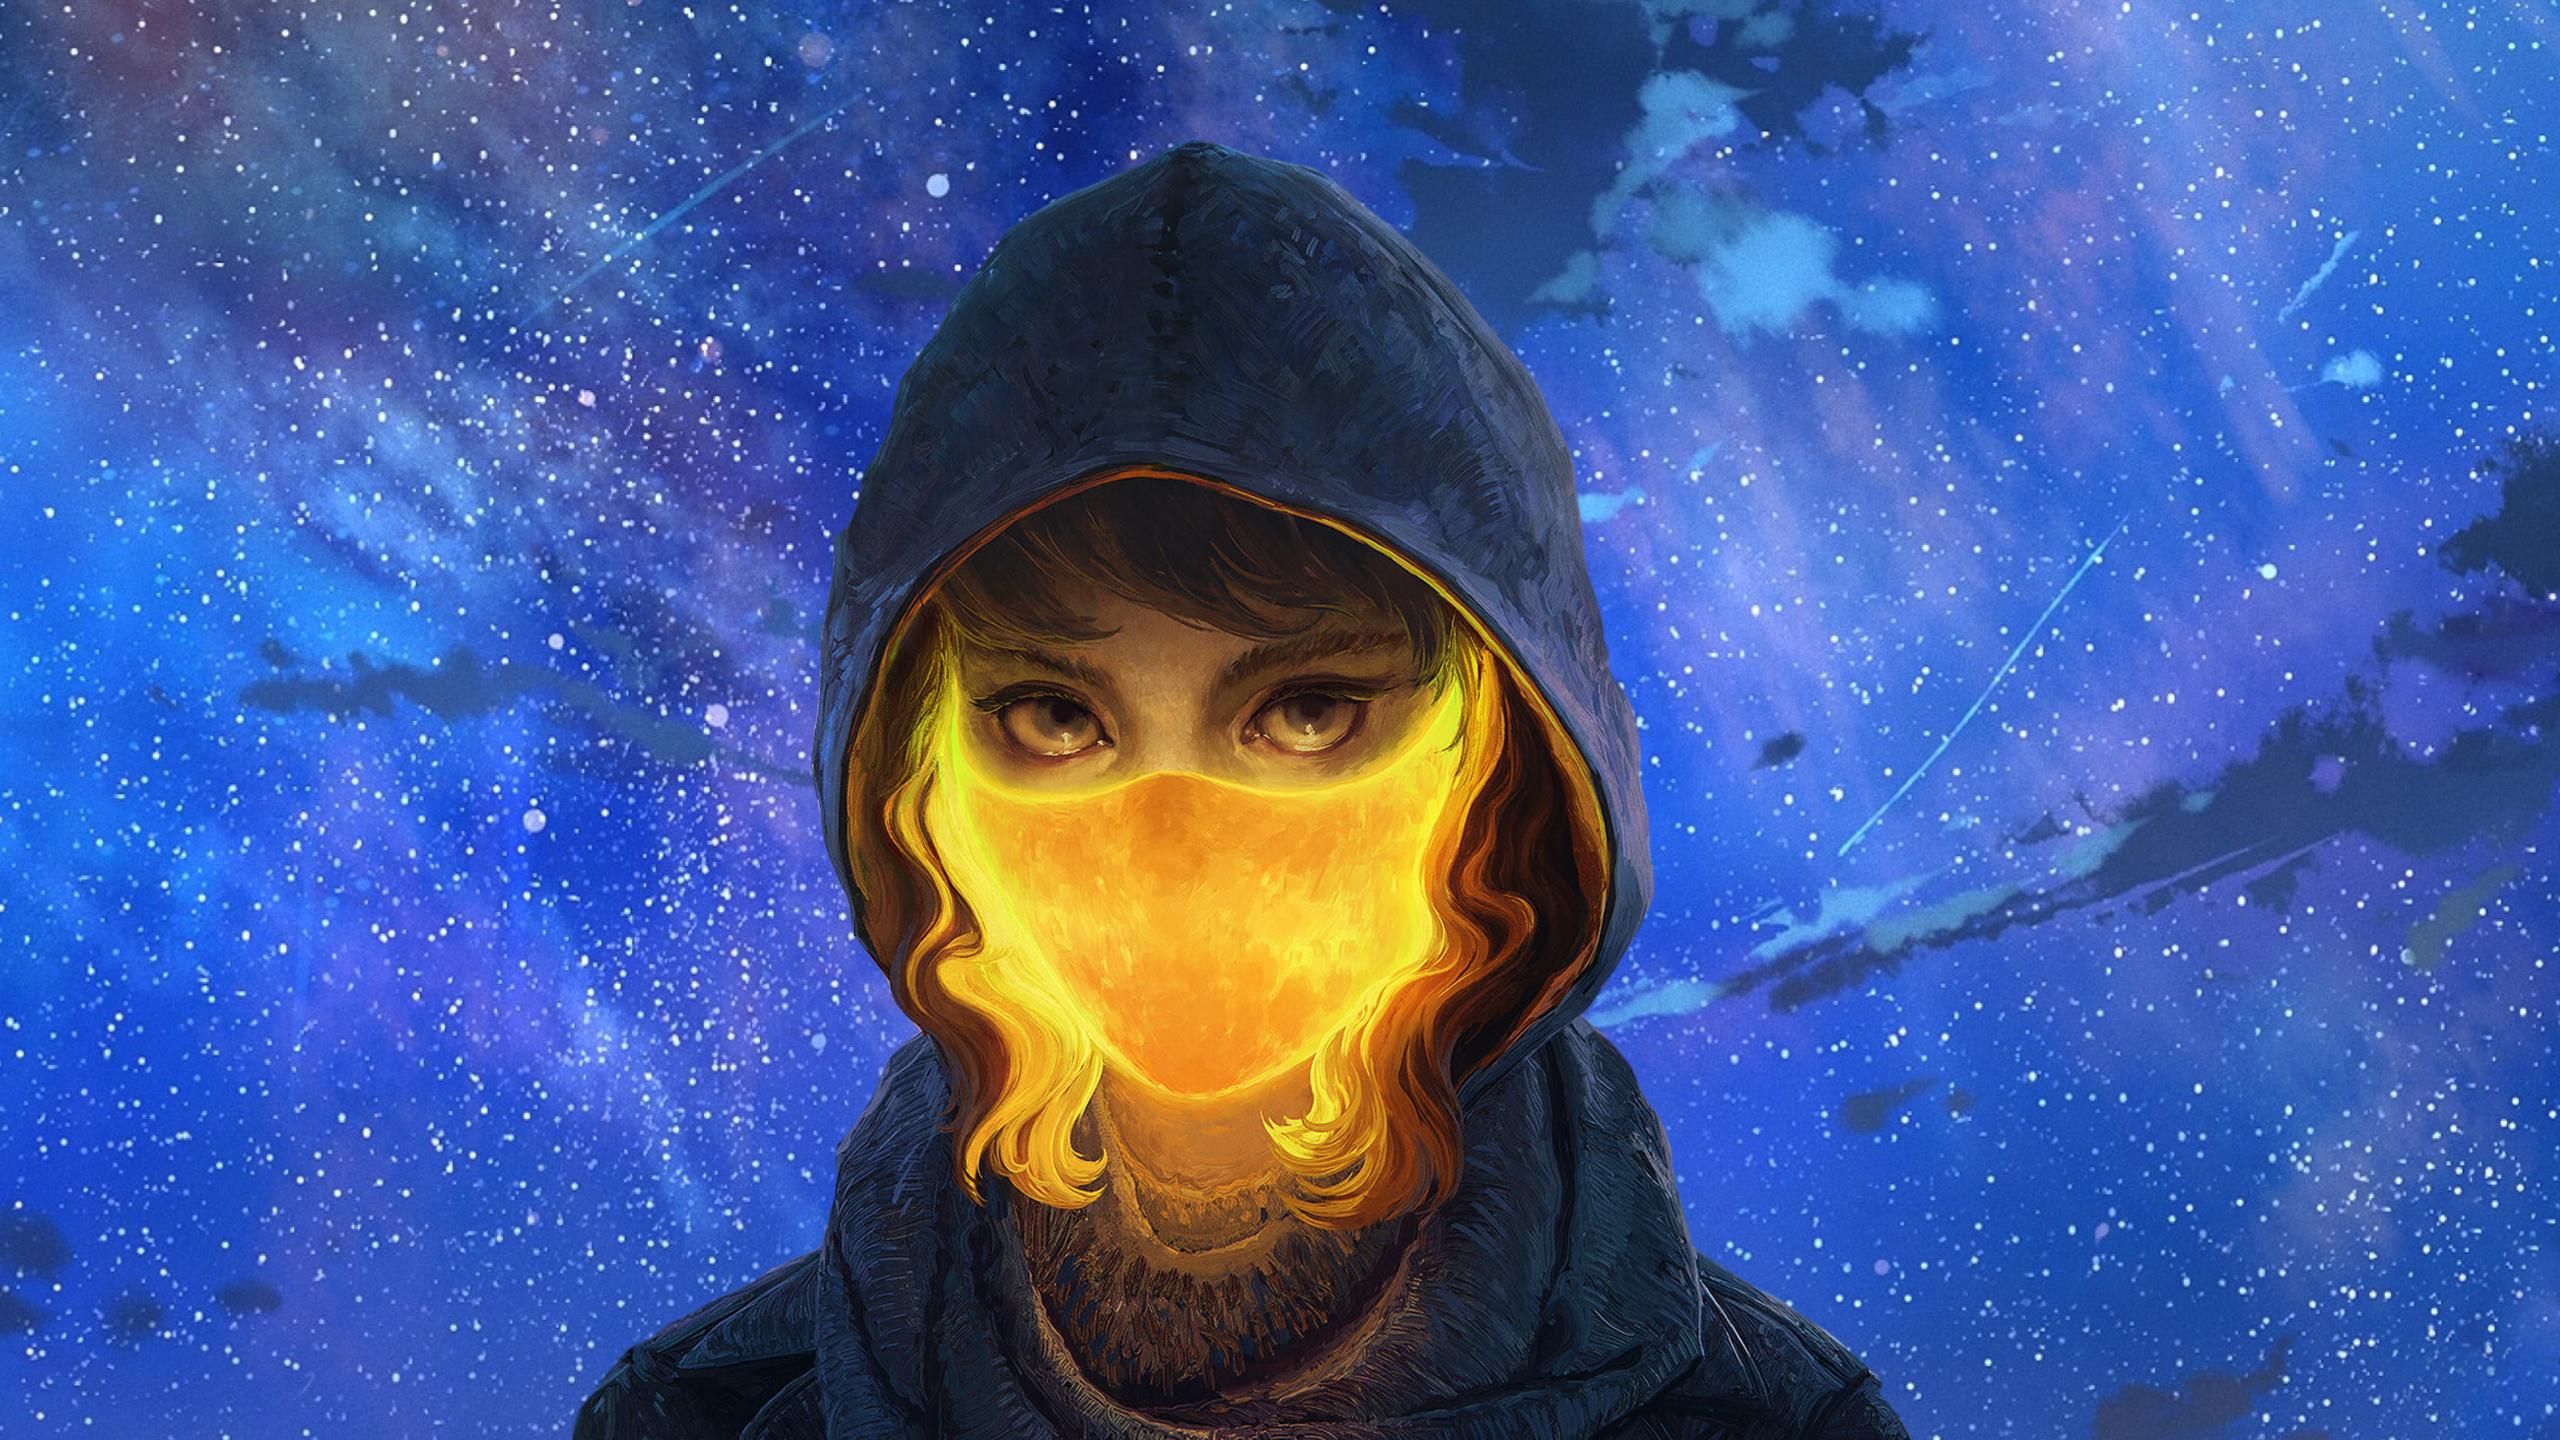 General 2560x1440 women mask hoods glowing stars sky curly hair night